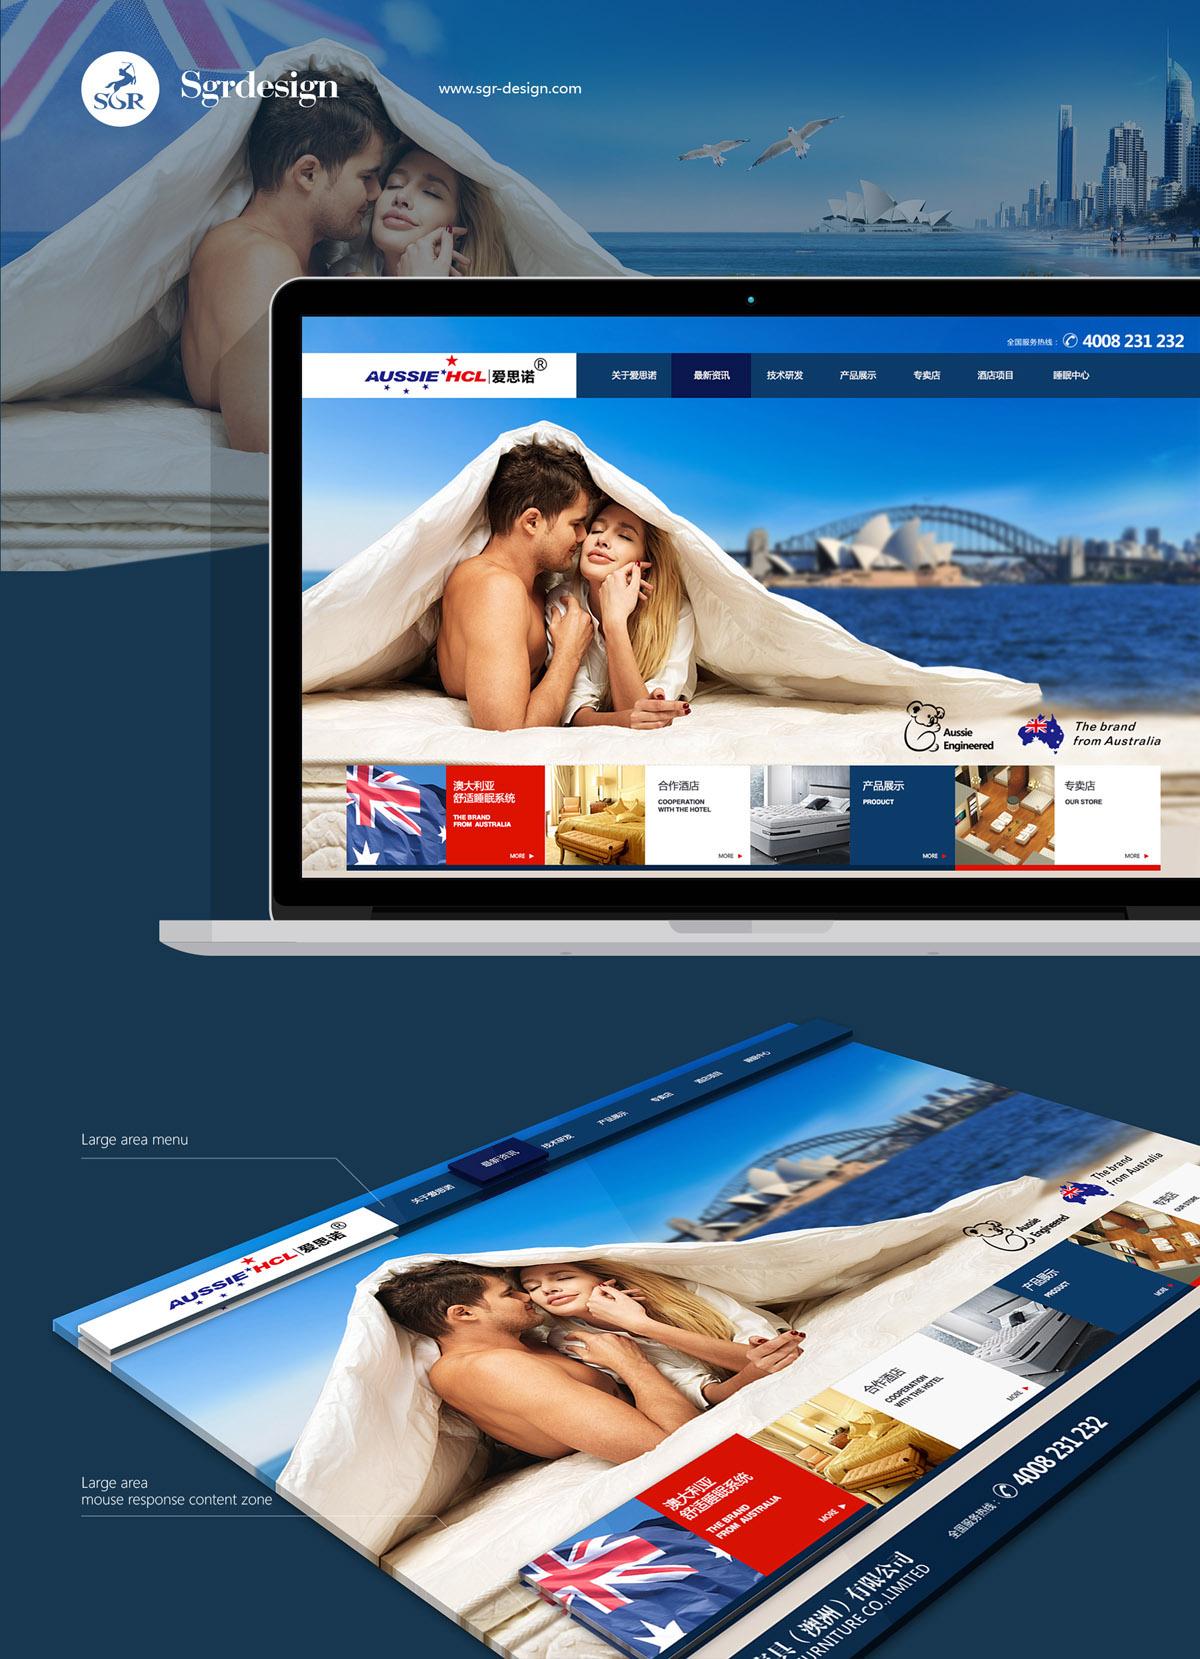 Web design UI brand Australia mattress SGR